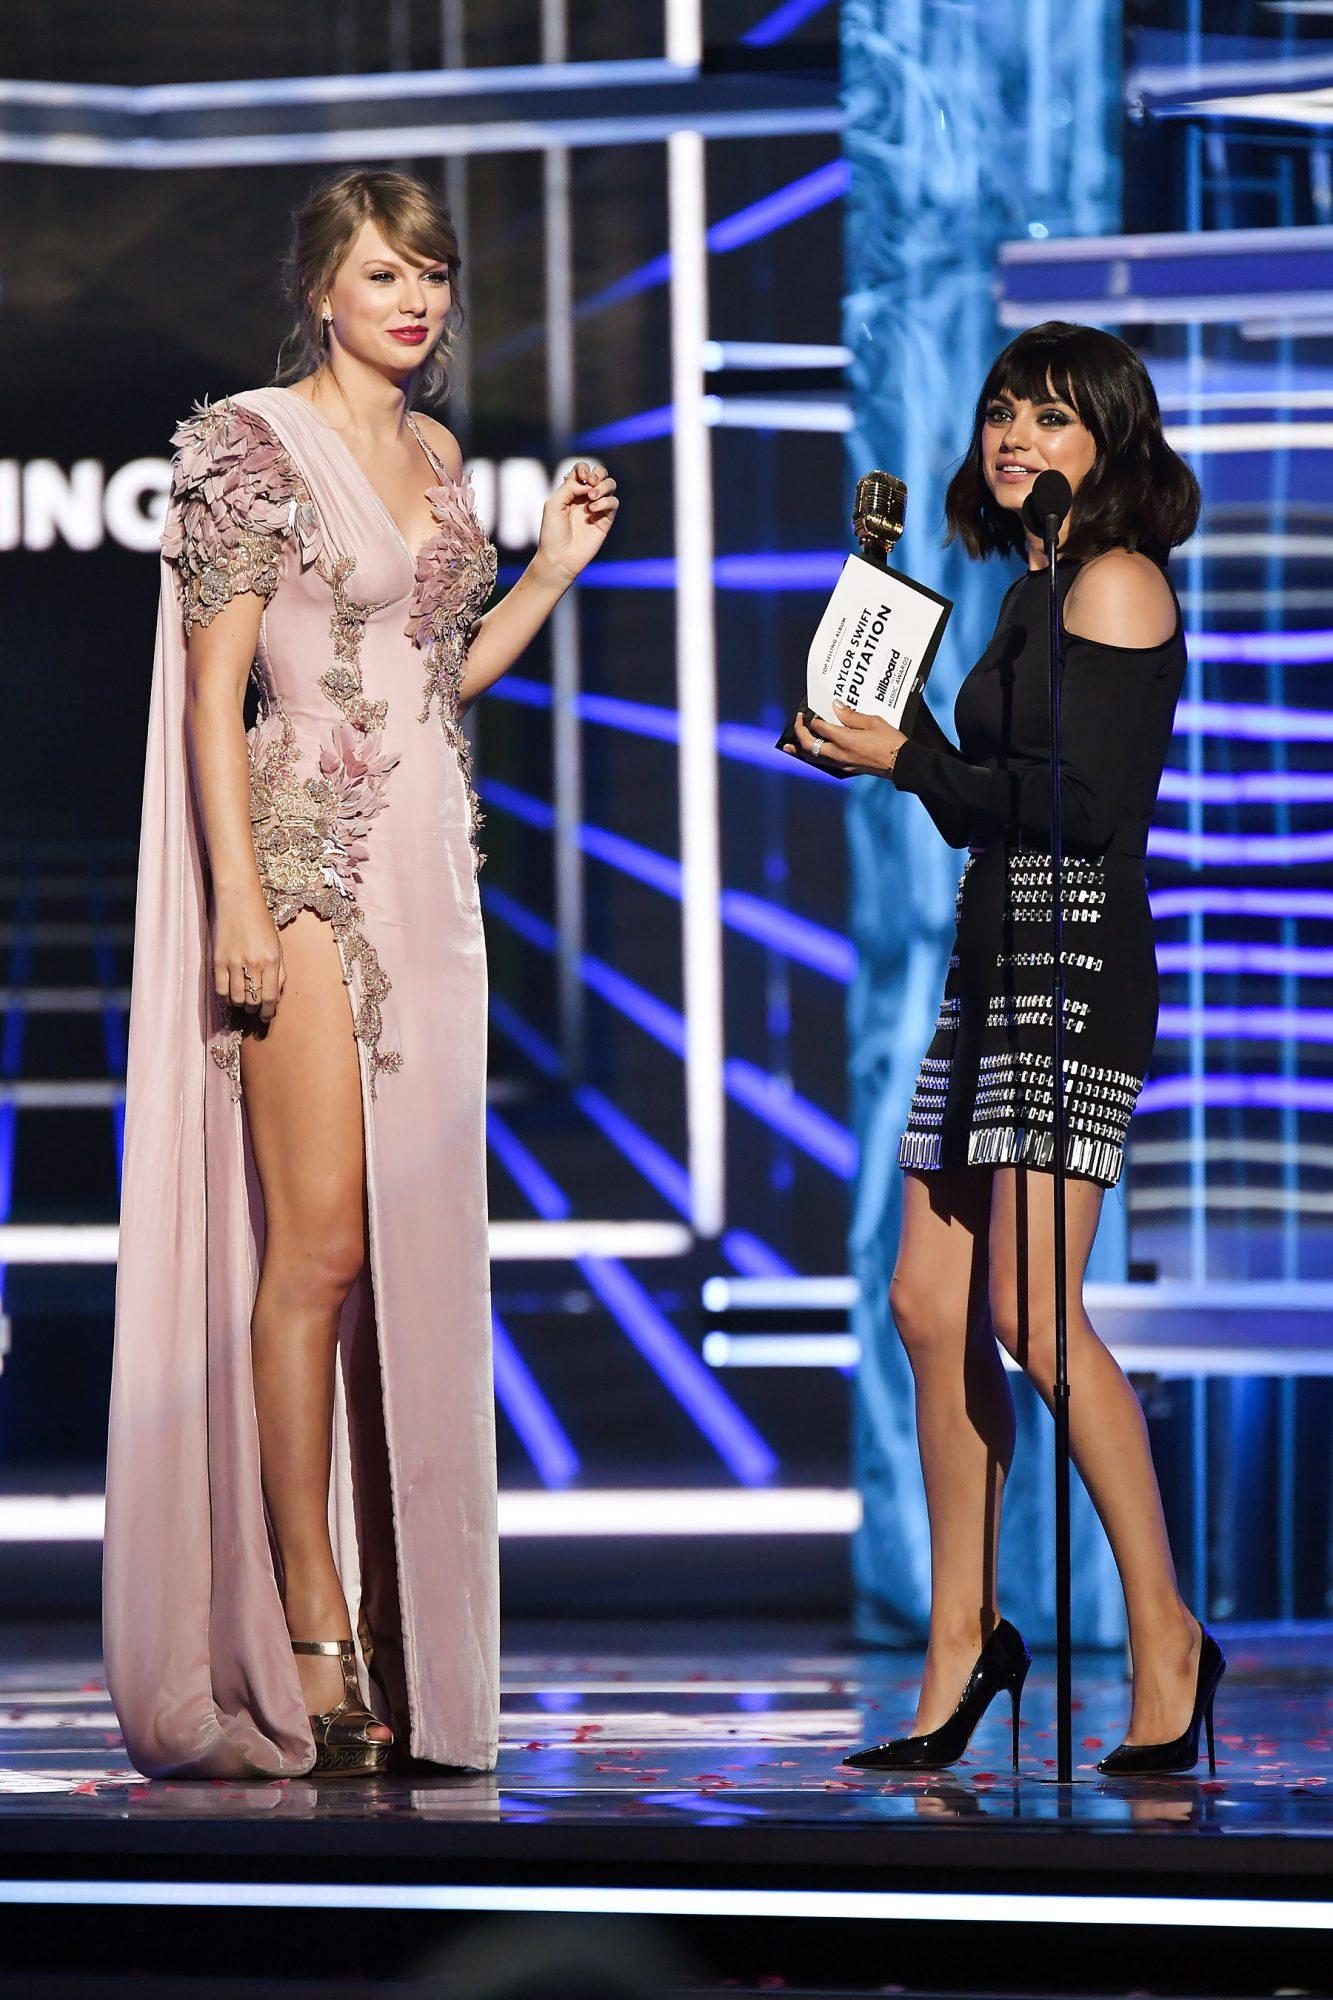 Billboard Music Awards, Show, Las Vegas, USA - 20 May 2018